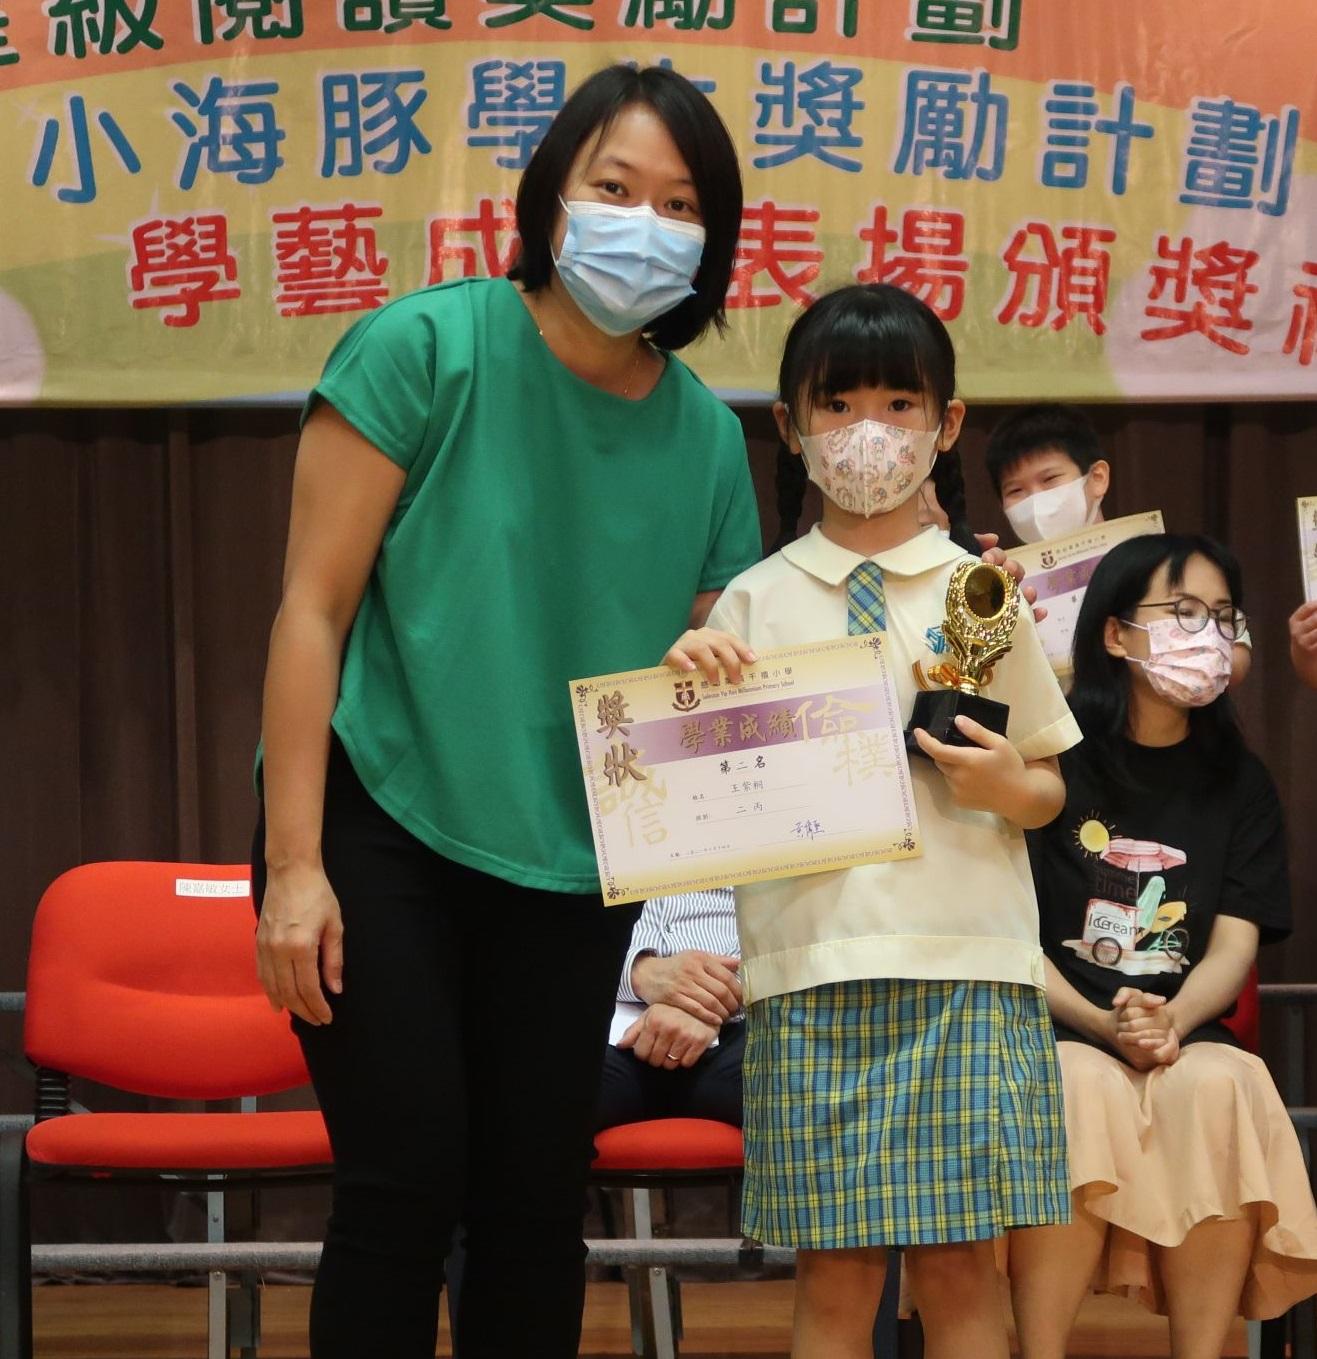 https://syh.edu.hk/sites/default/files/img_5410.jpg